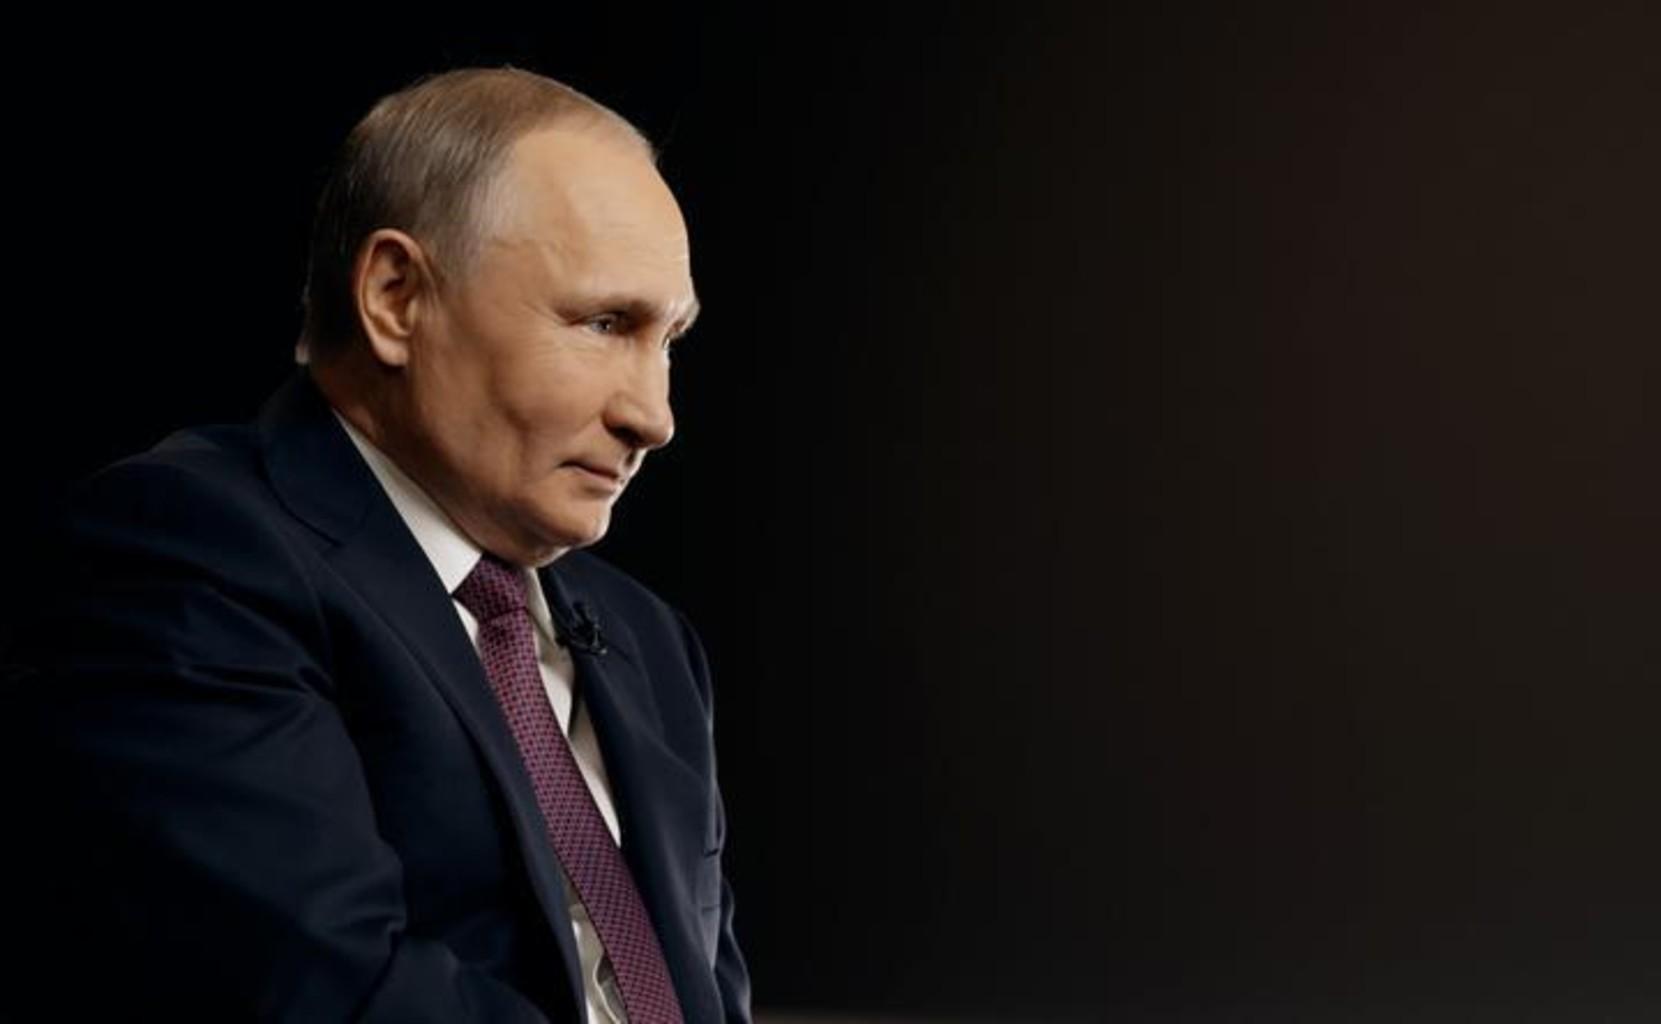 Фото: пресс-служба президента России